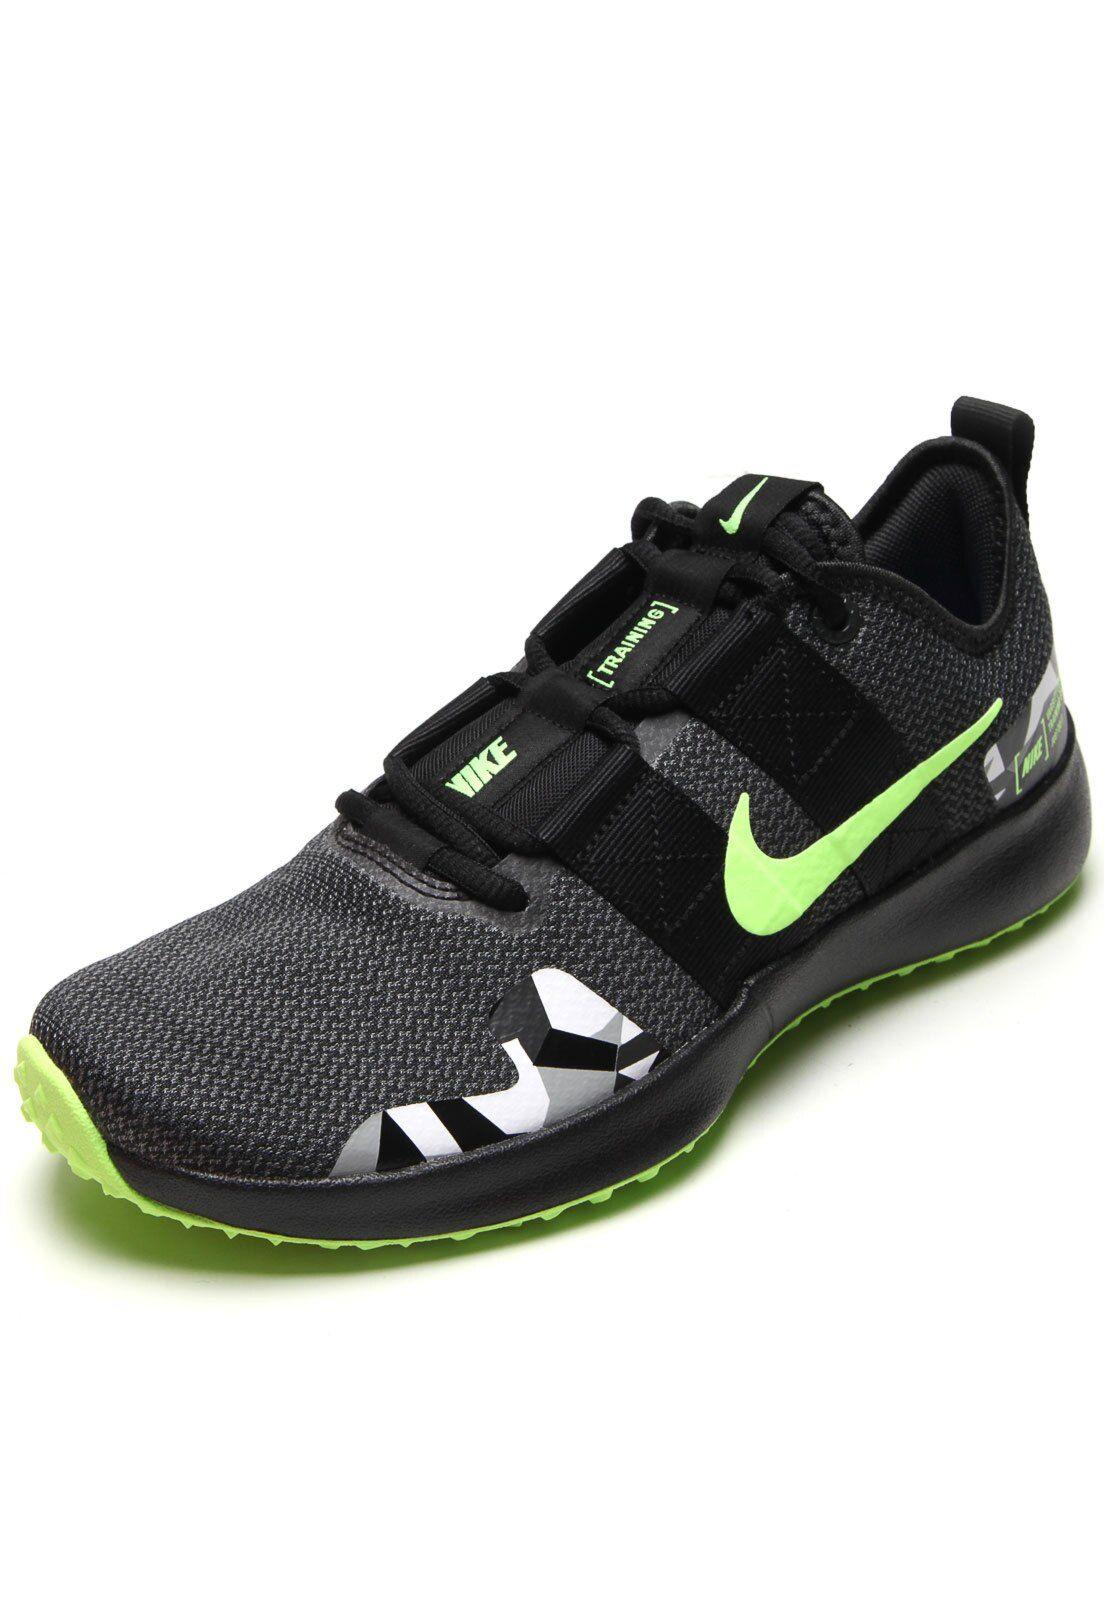 Tênis Nike Varsity Compete Tr 2 PretoVerde em 2020 | Tenis